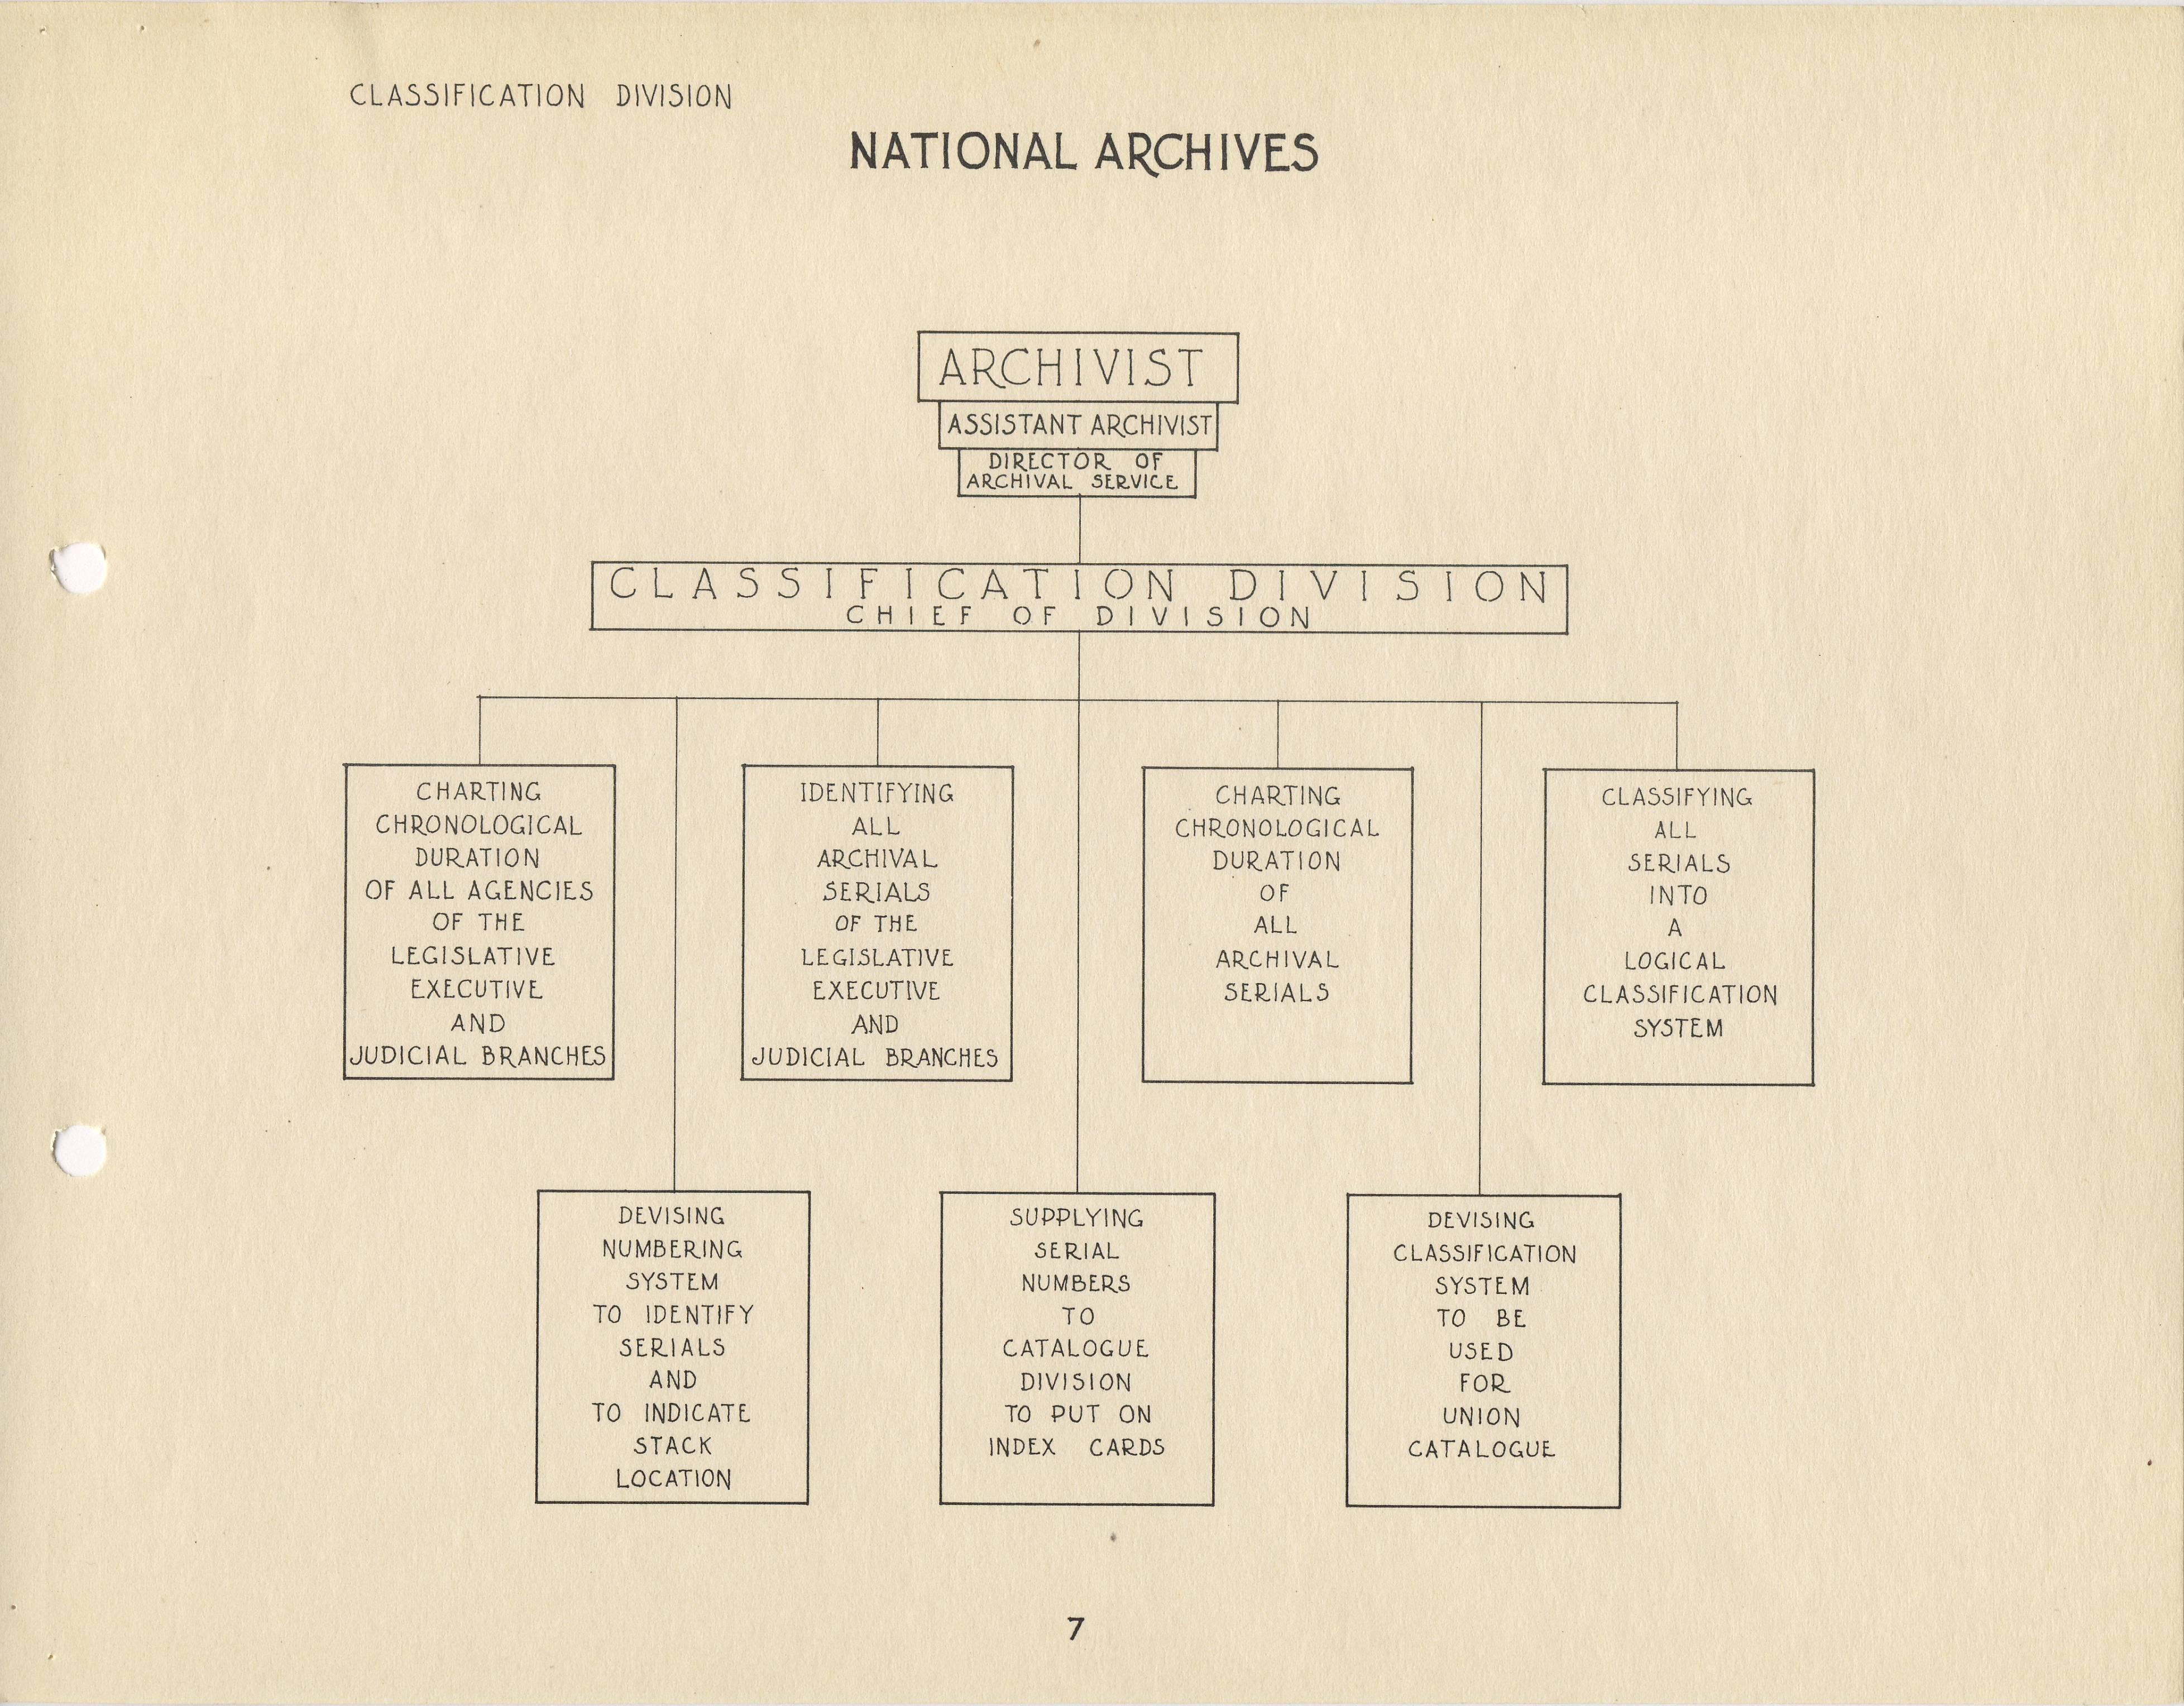 RG 64, P 39, file 051-46 - 7 - Classification Division Org. Chart, Dec. 1935